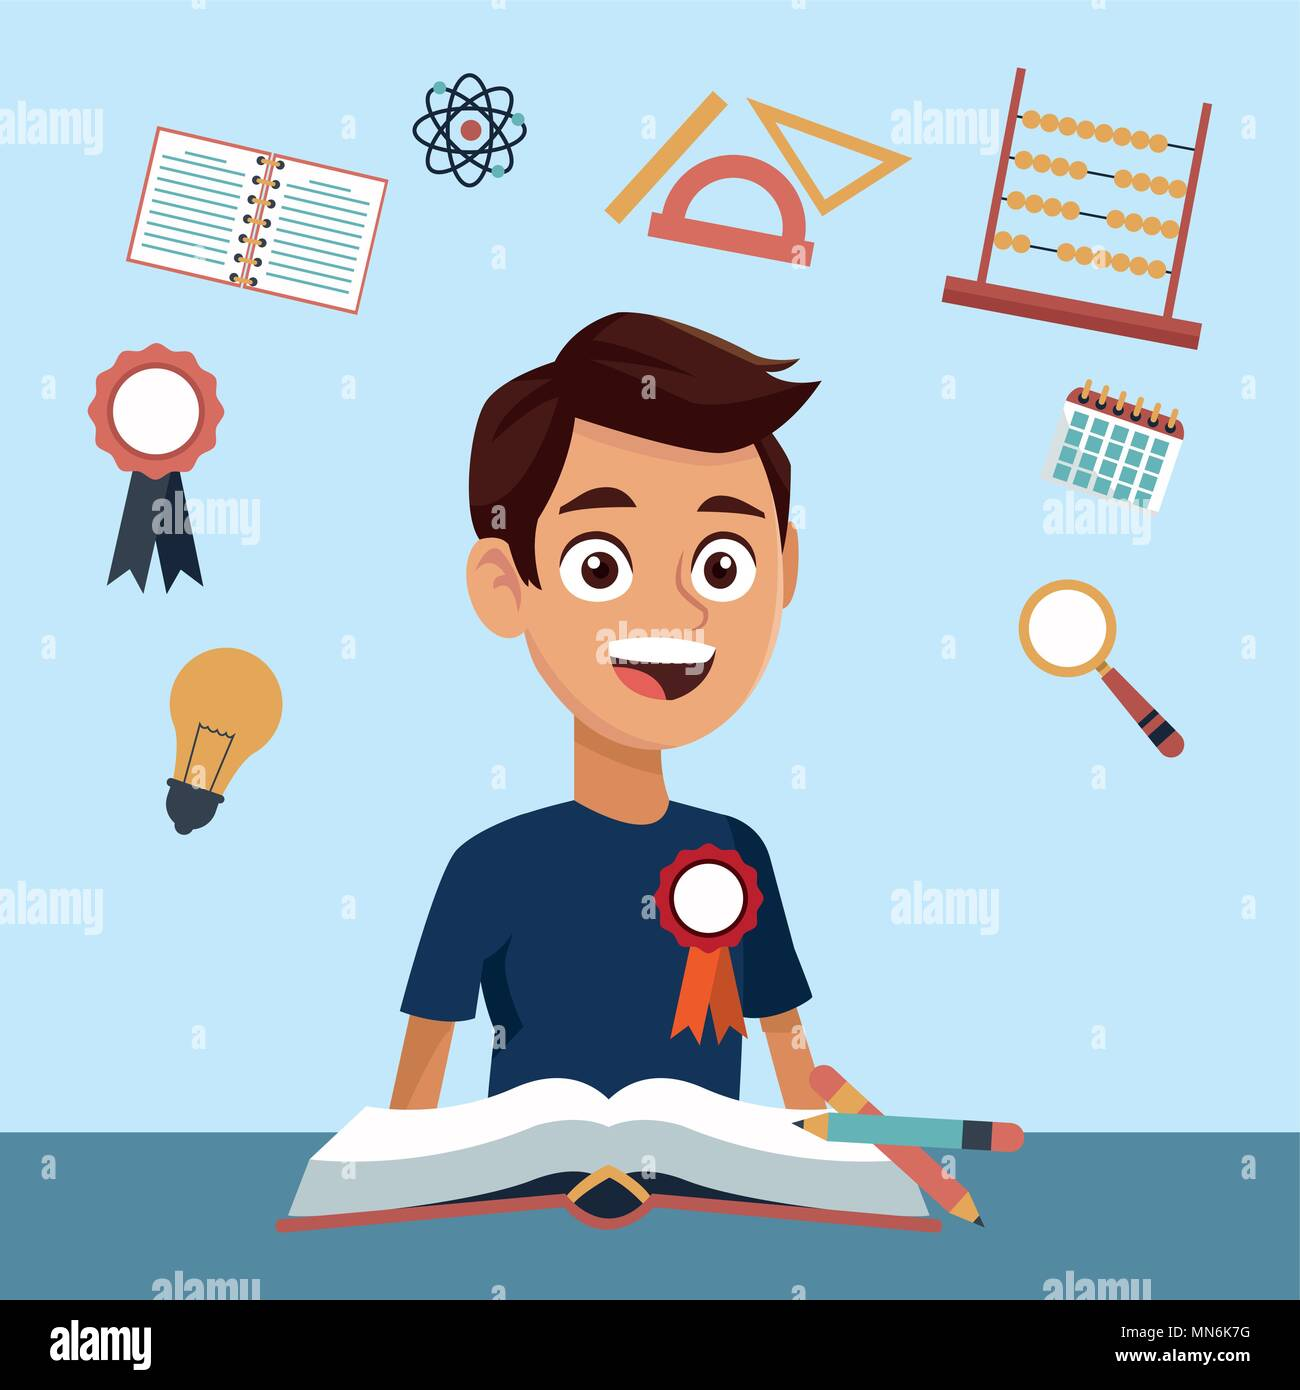 High school education cartoon - Stock Vector